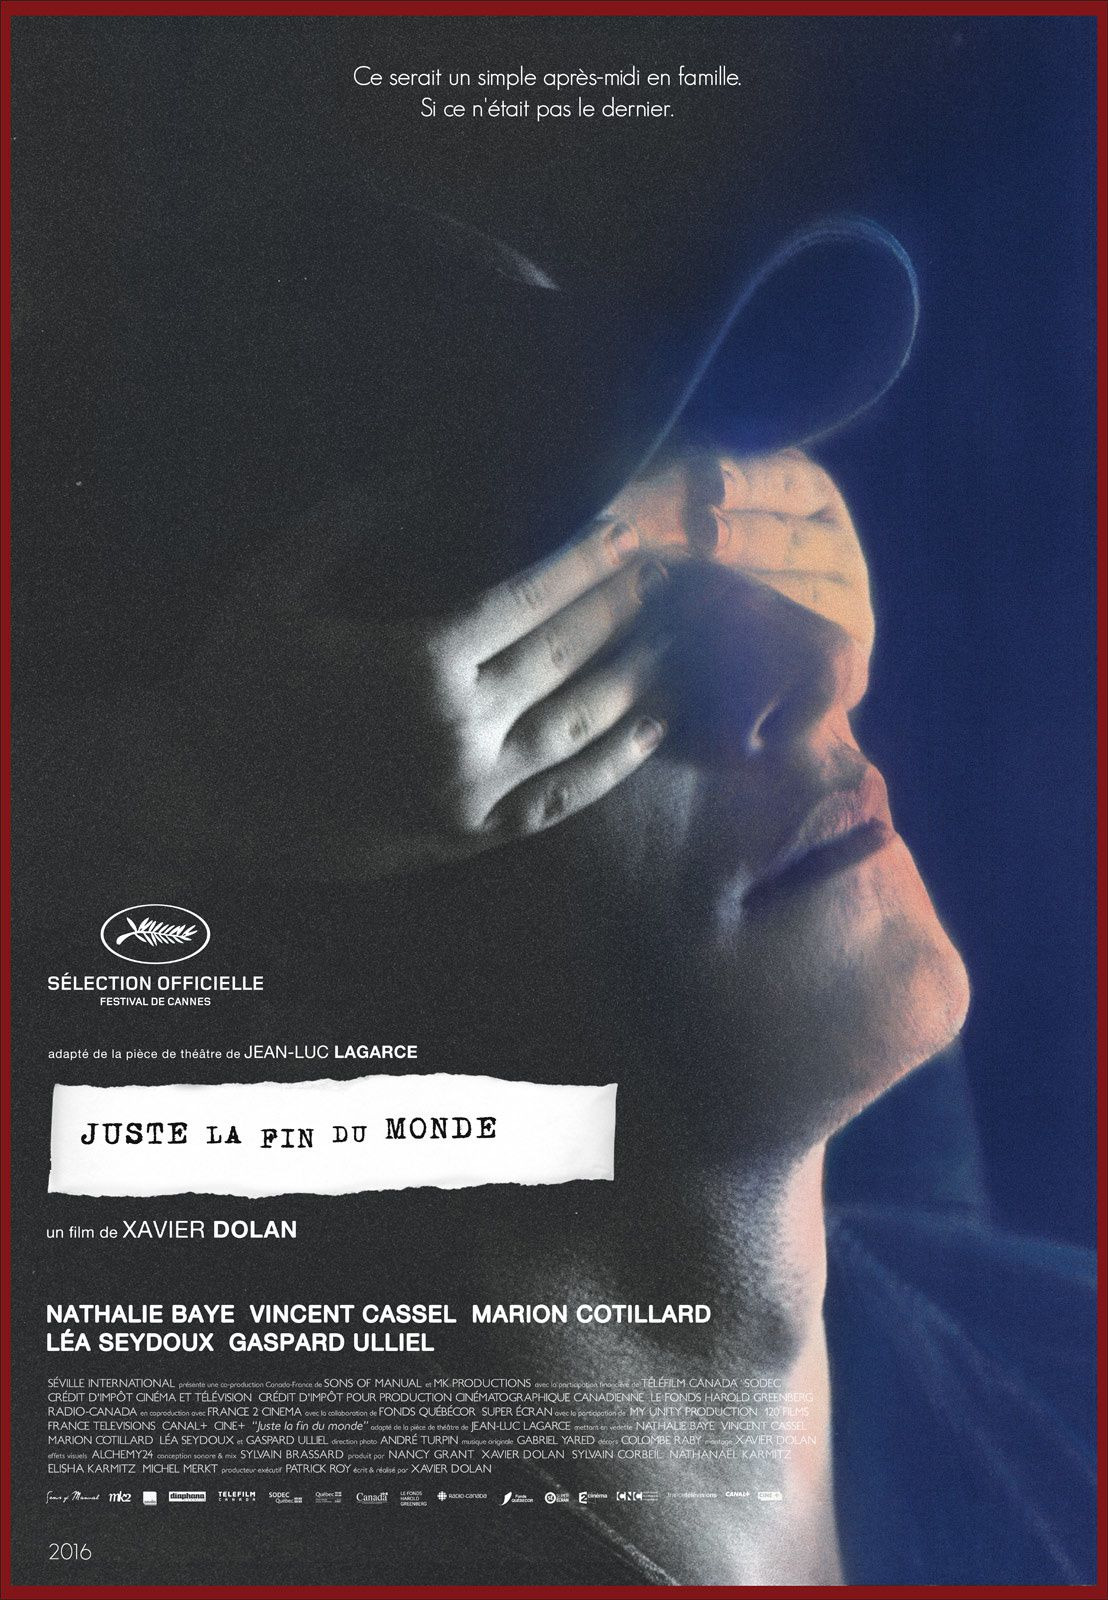 JUSTE LA FIN DU MONDE / CINEMA / XAVIER DOLAN. 2016